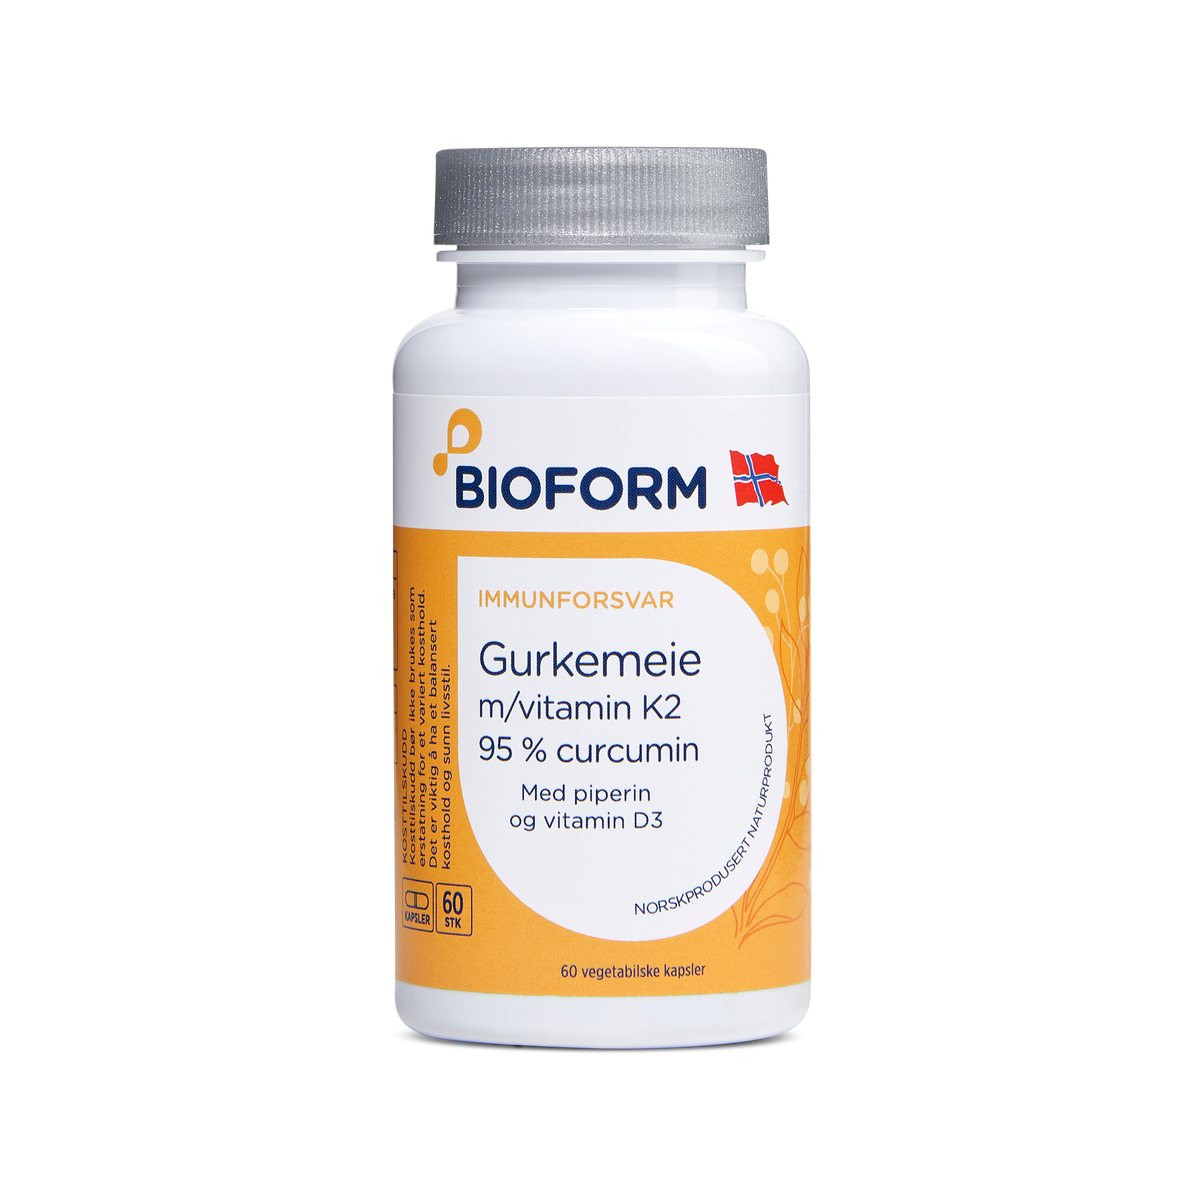 Gurkemeie m/vitamin K2 og D3 (Abonnement) KUN 1 STK. PR. KUNDE